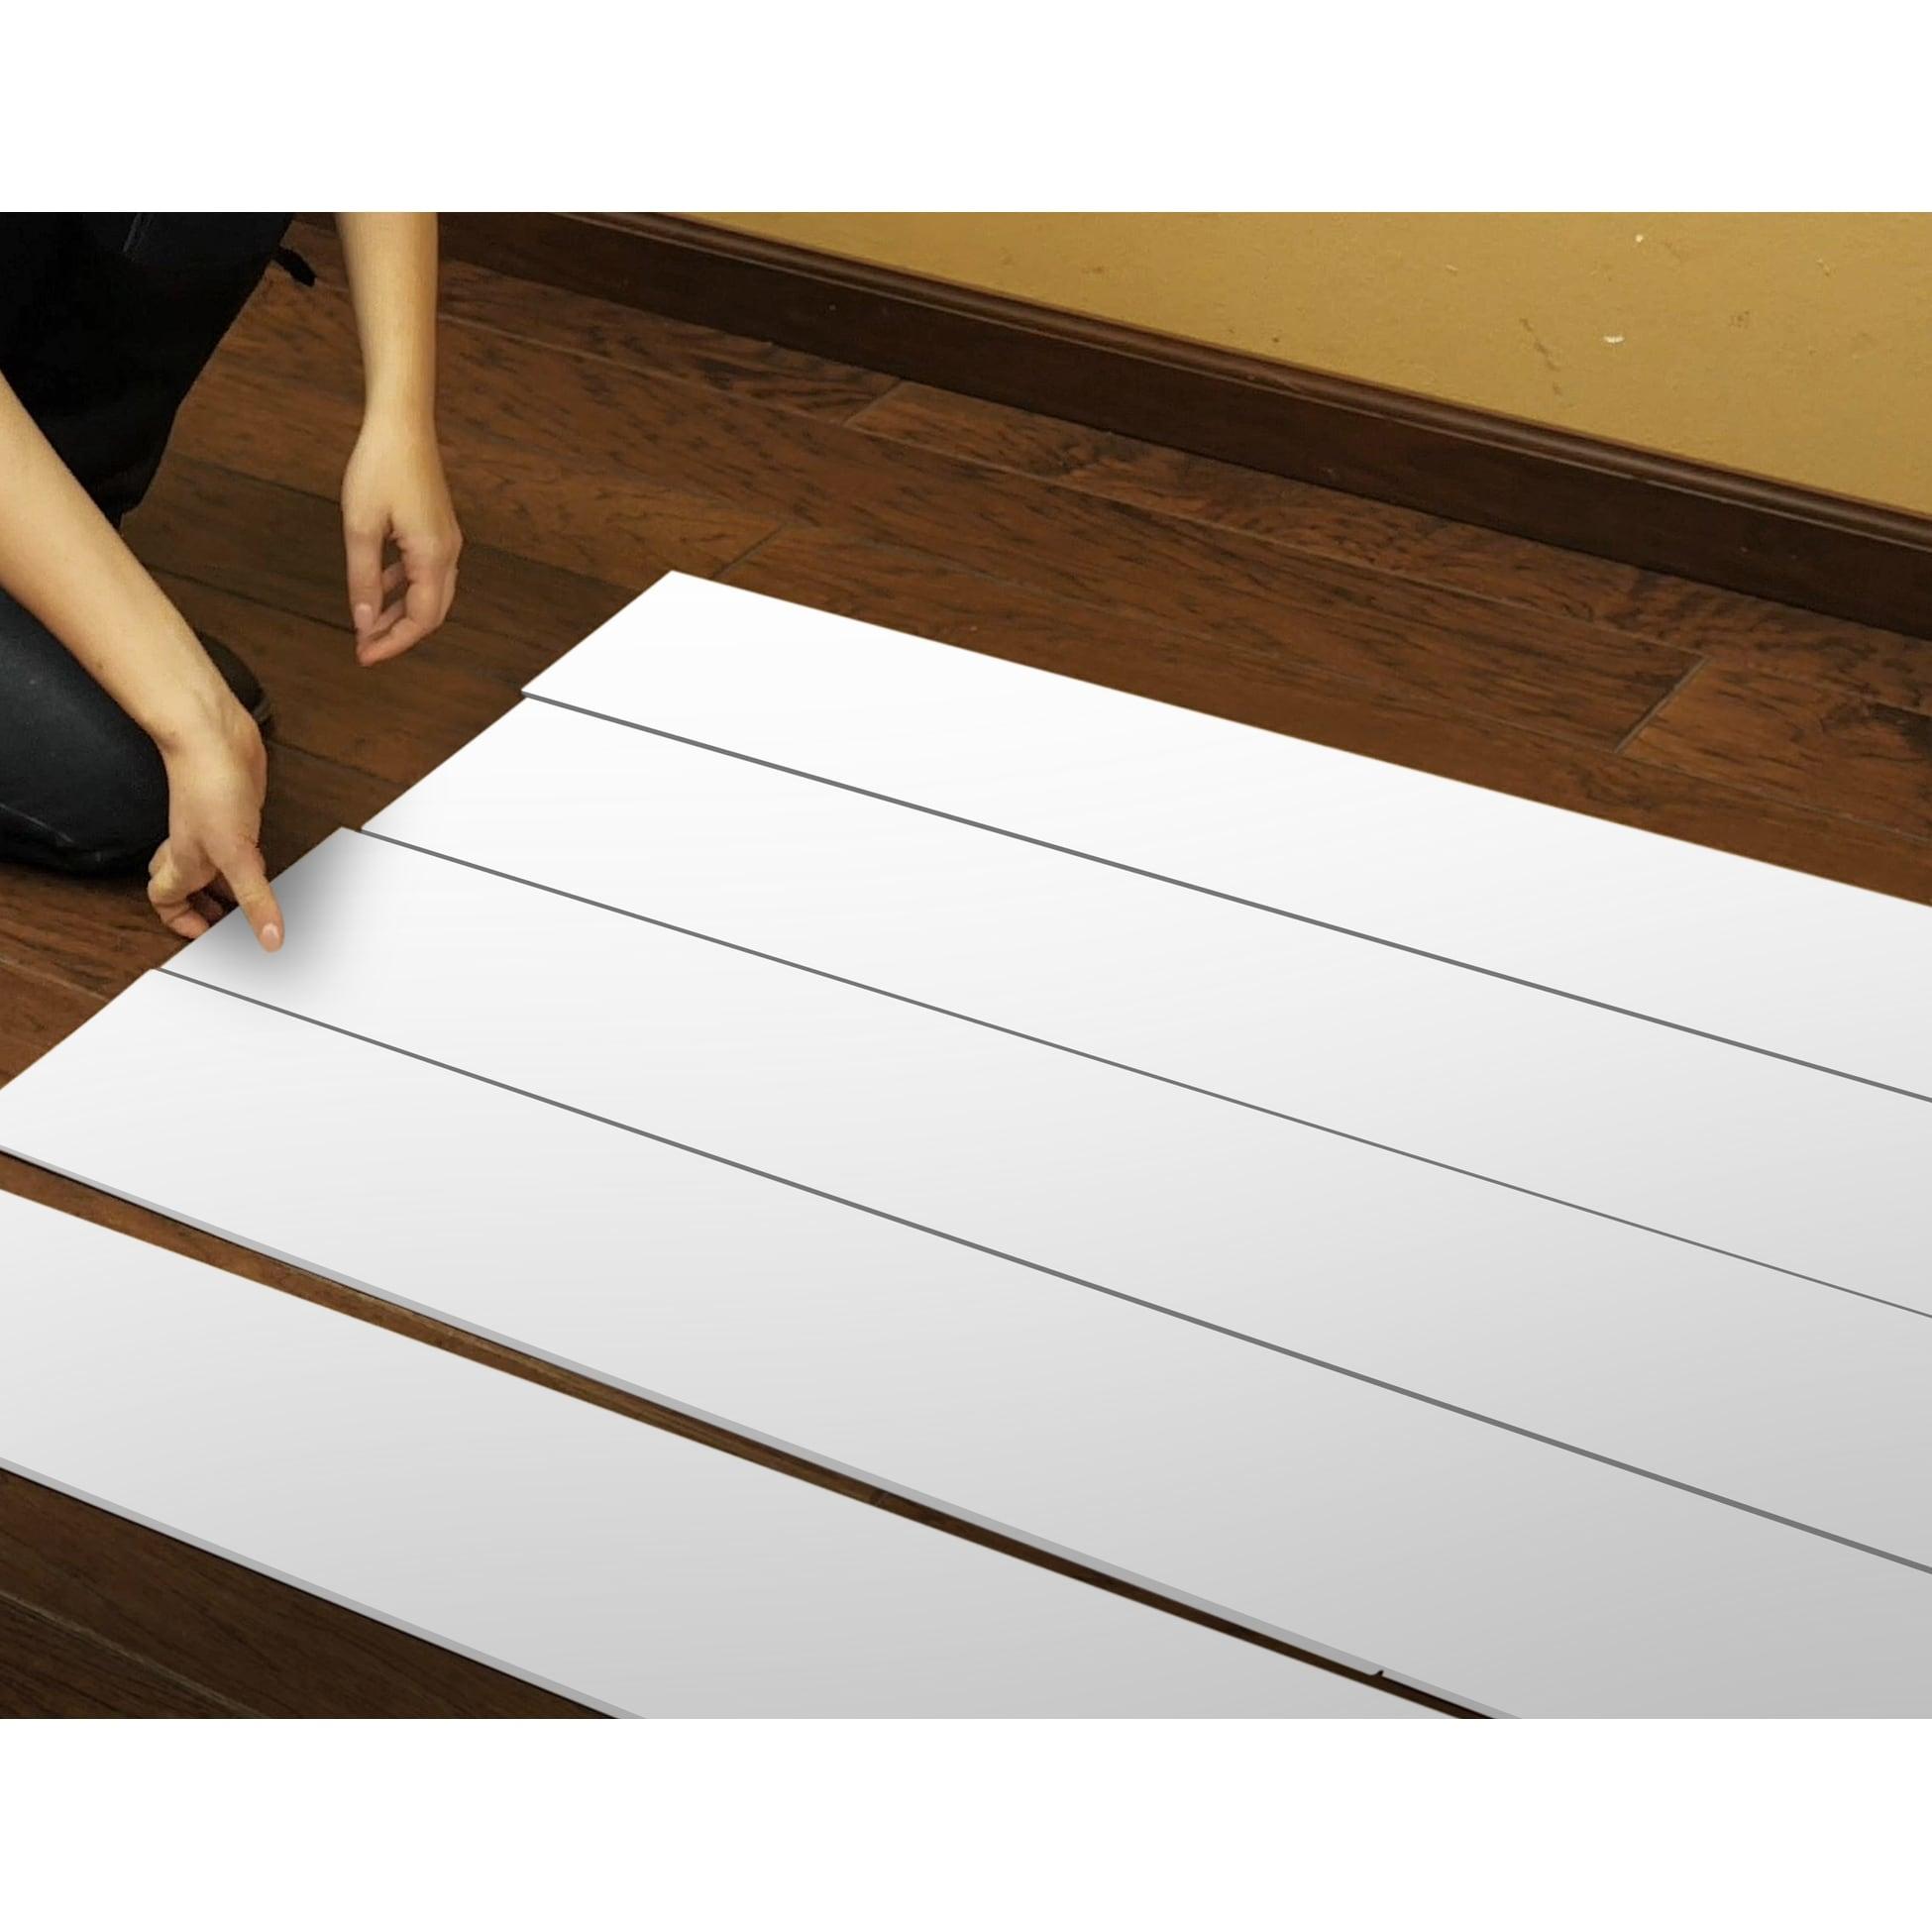 Shop Black Friday Deals On Novogratz True Shiplap Peel Stick Vinyl Real Wood Wall Panels 26 4 Sq Ft Of 7 44 Wide Panels Overstock 31961285